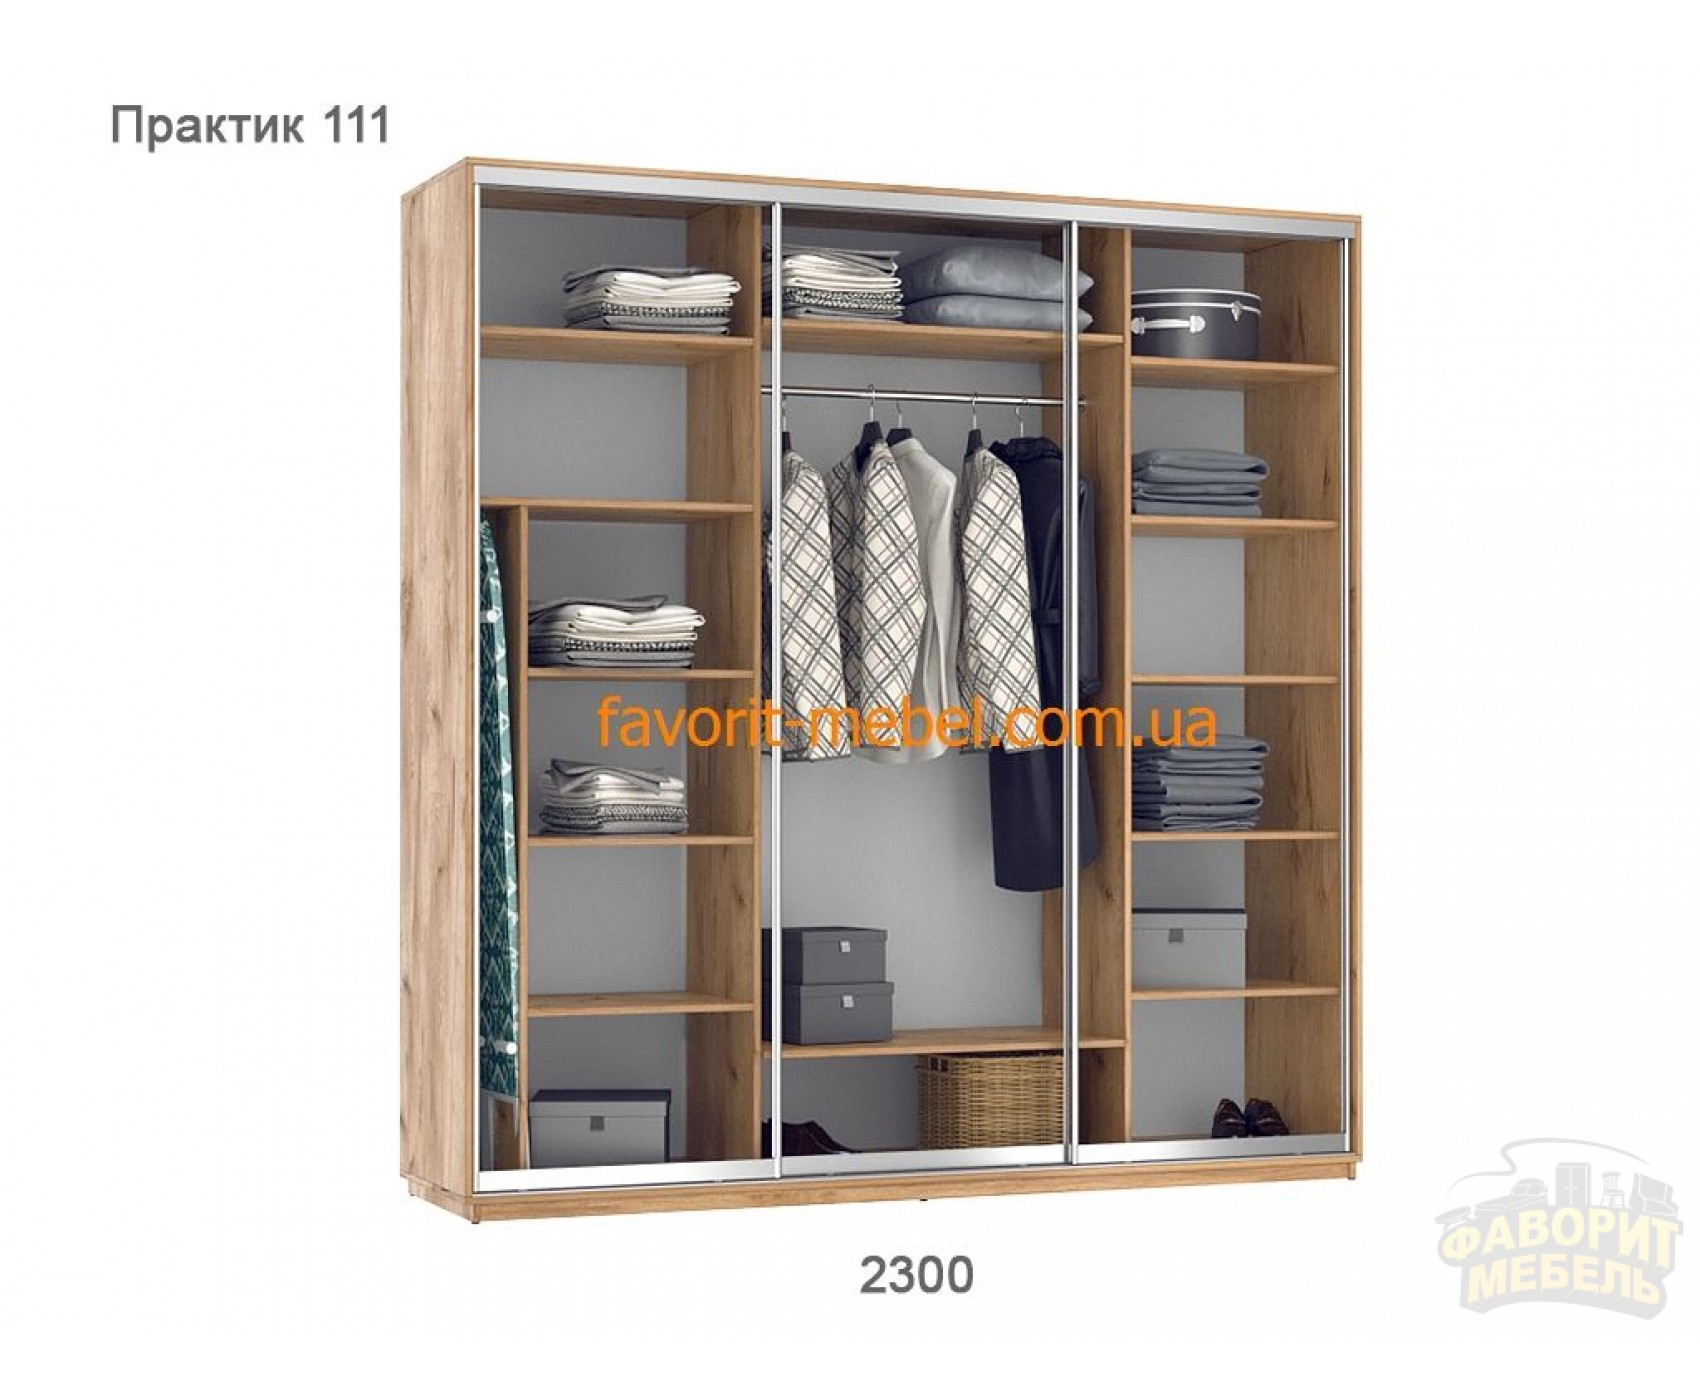 Шкаф купе Практик 111/3 (230х60х240 см) со склада 3дв Зеркало/Зеркало/Зеркало Дуб сонома